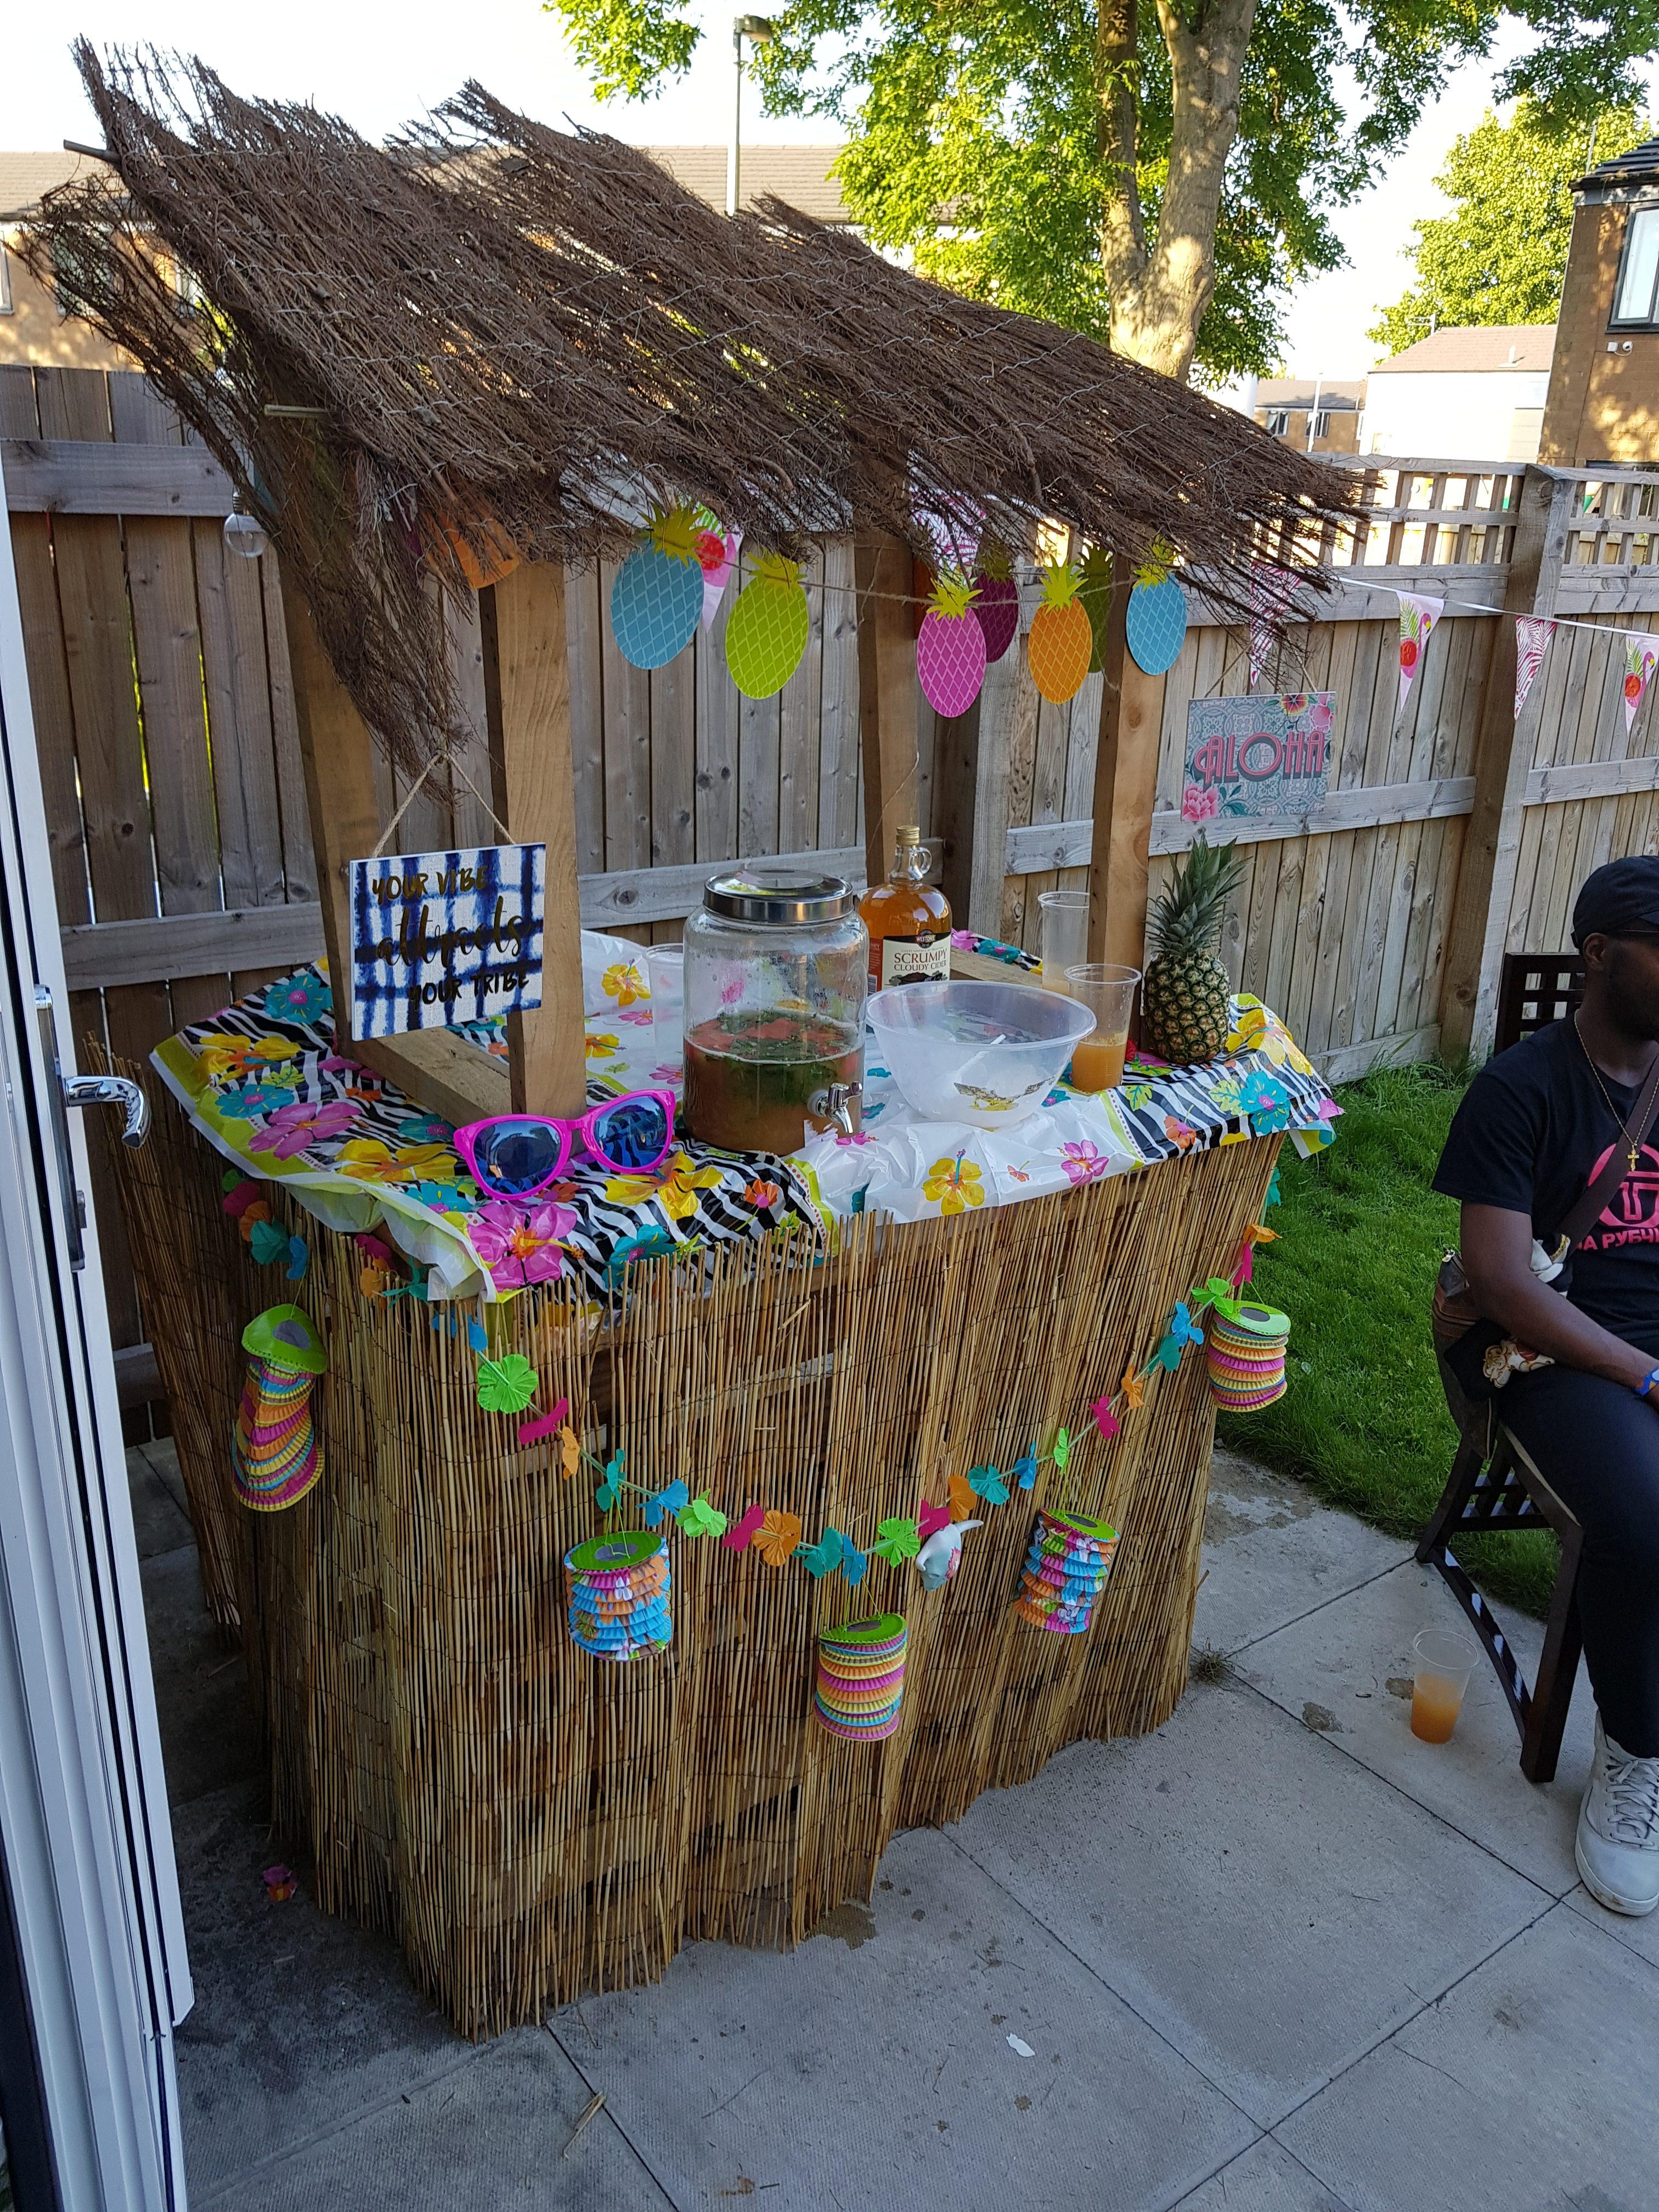 DIY Tiki Bar made from pallets